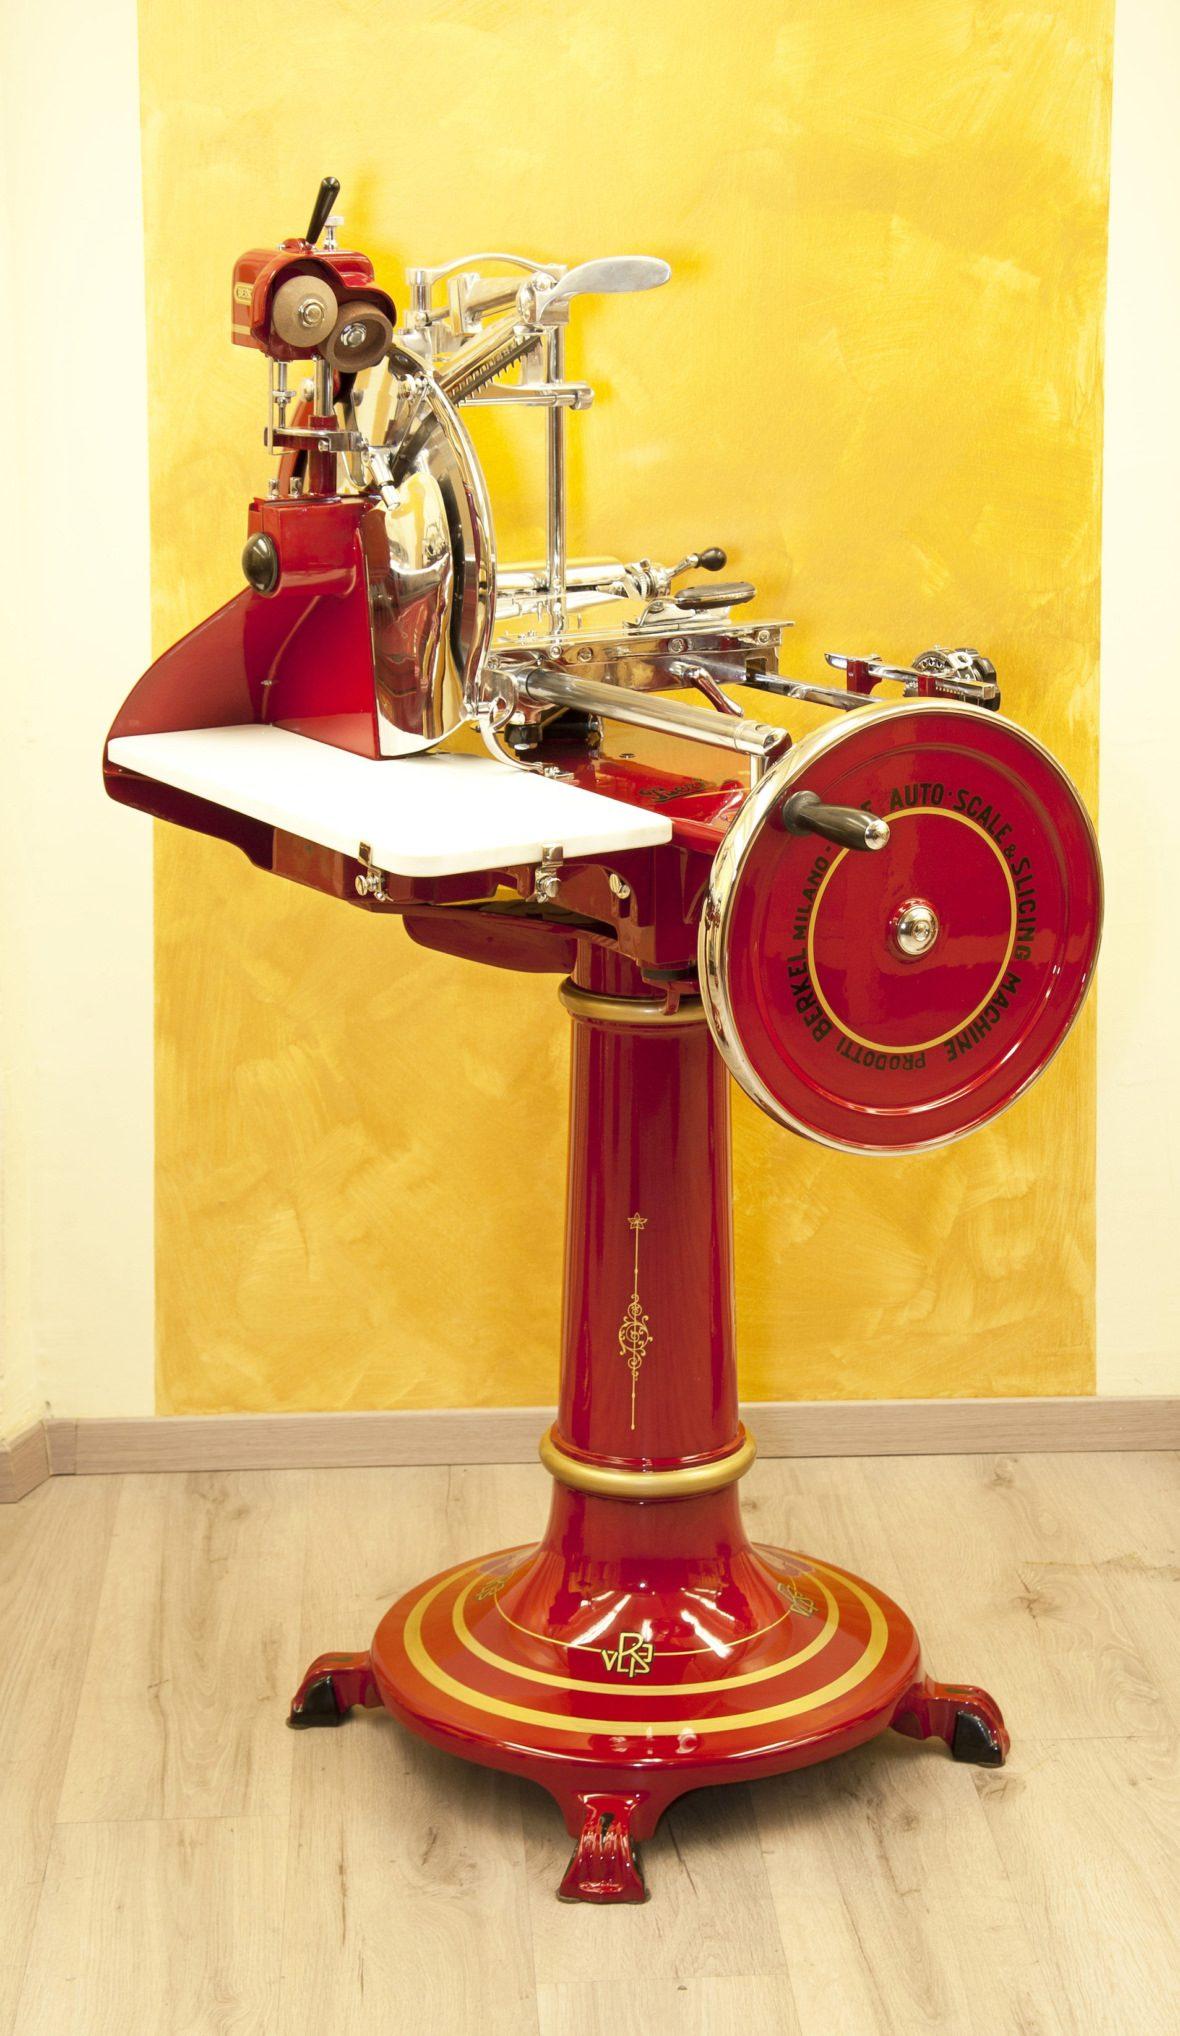 Berkel slicer model 12 red